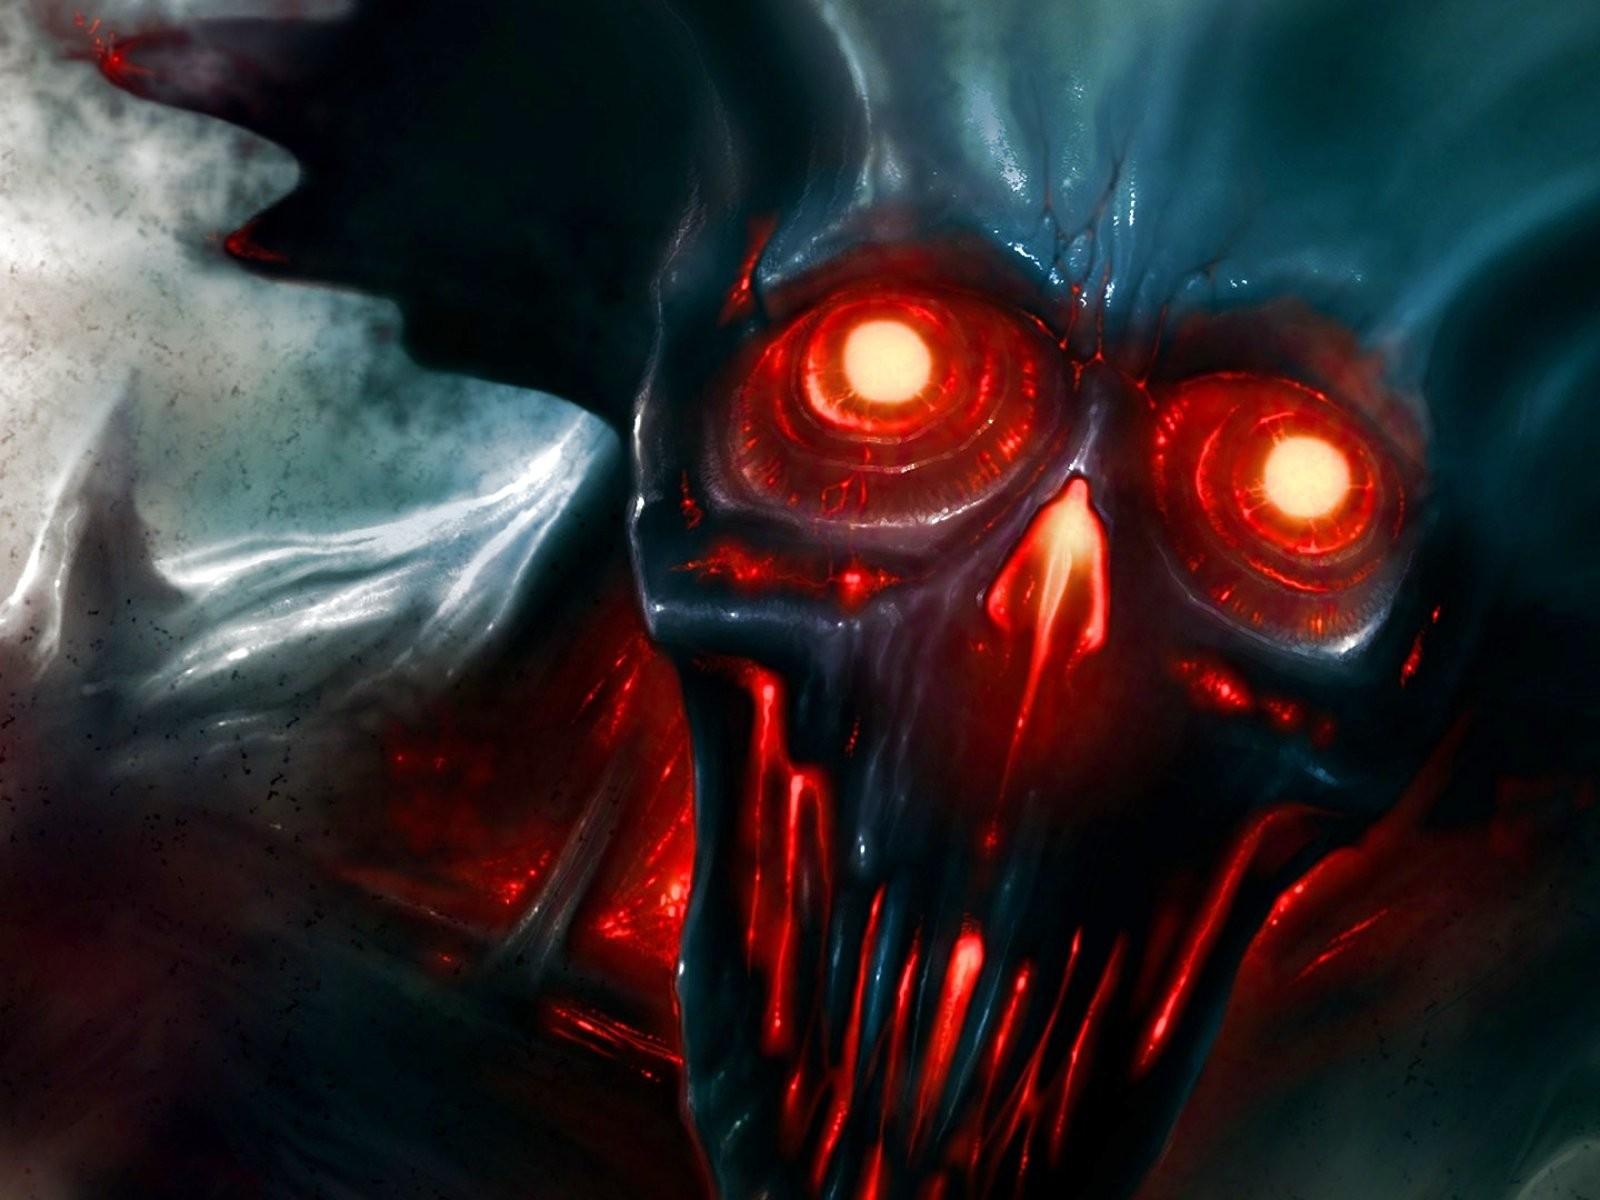 Evil, Wallpaper Images, Artwork, Original, Dark, Scary, - Halloween Creepy - HD Wallpaper